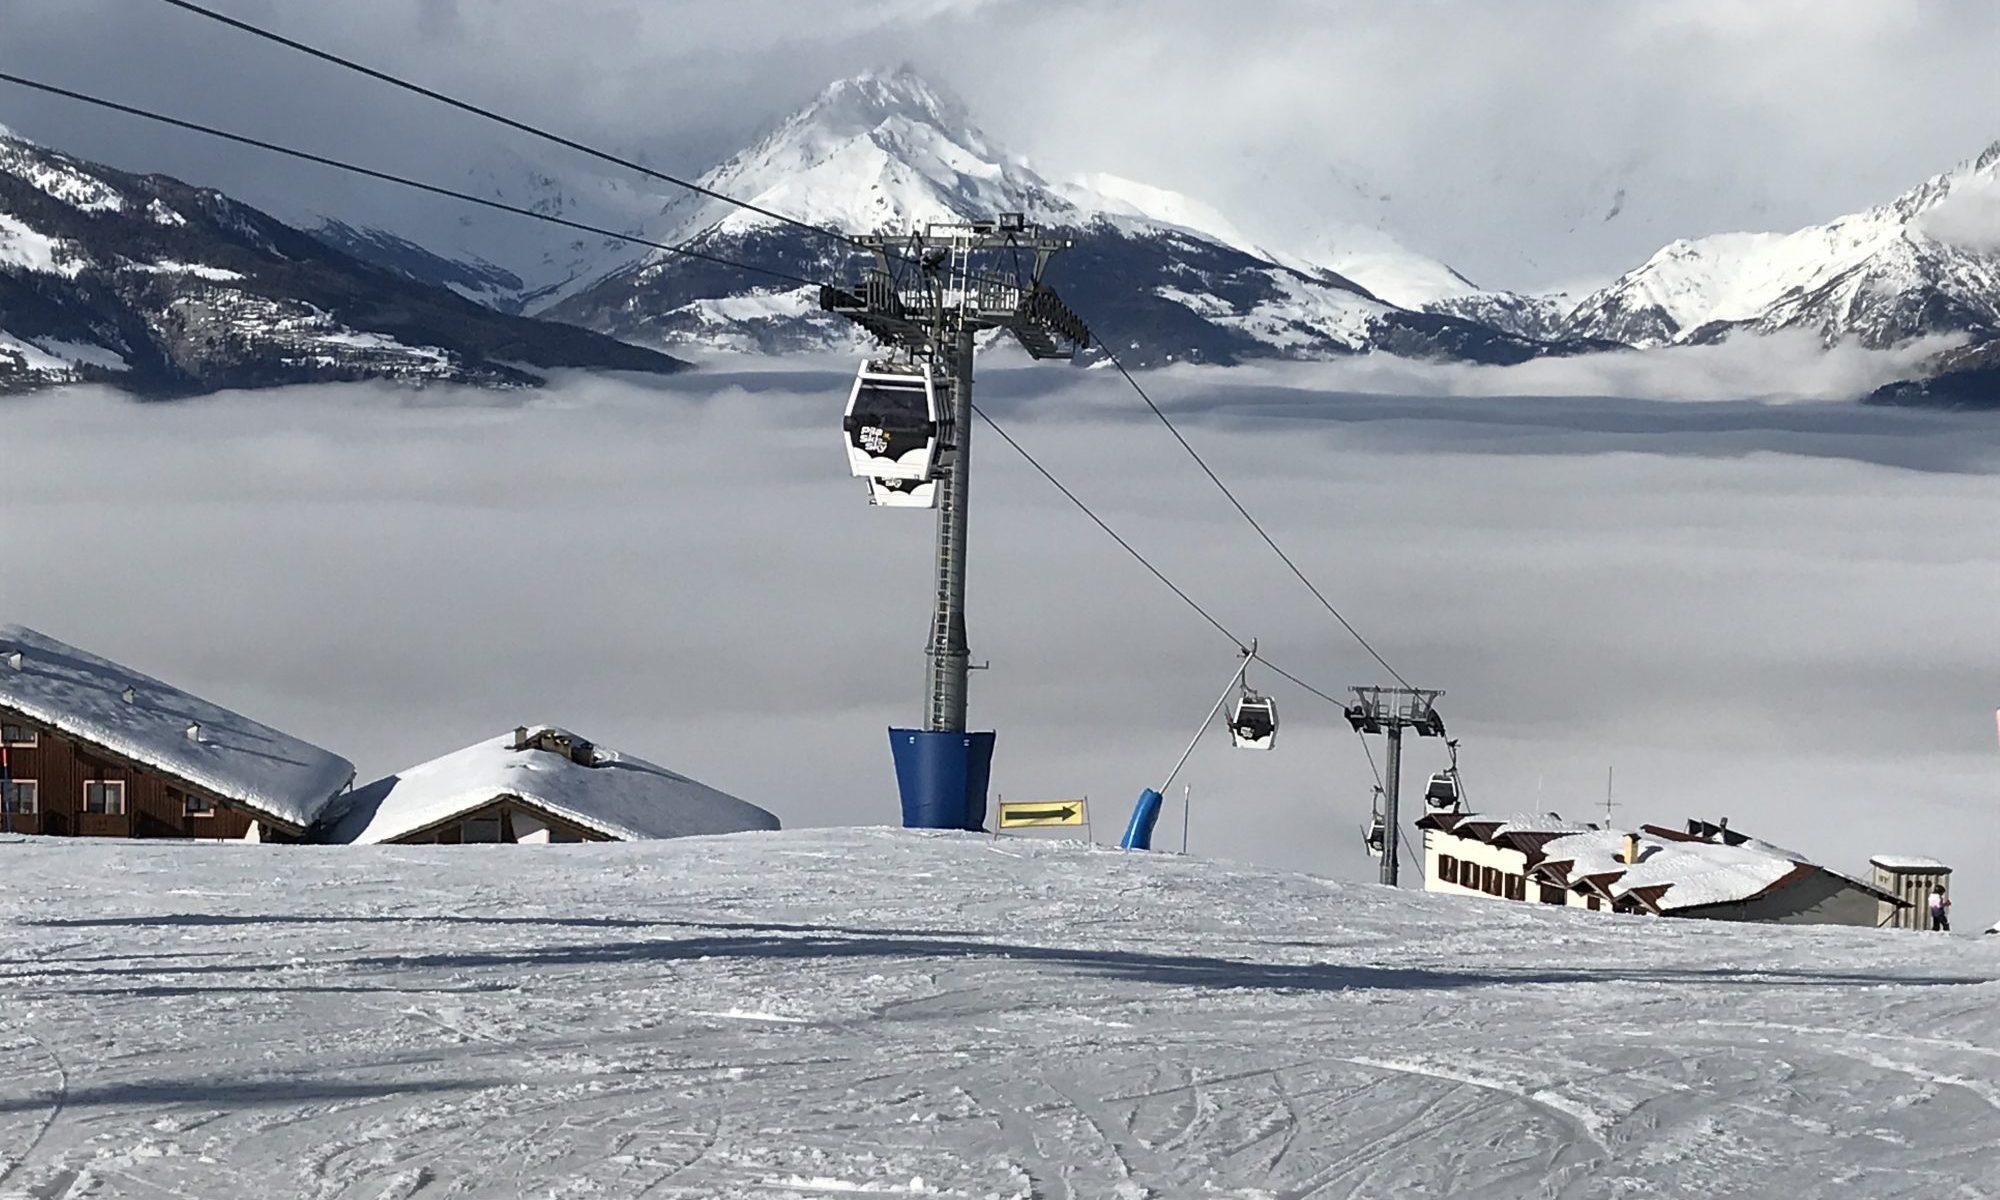 Family trip to Pila, Valle d'Aosta - Half term- Photo by The-Ski-Guru.